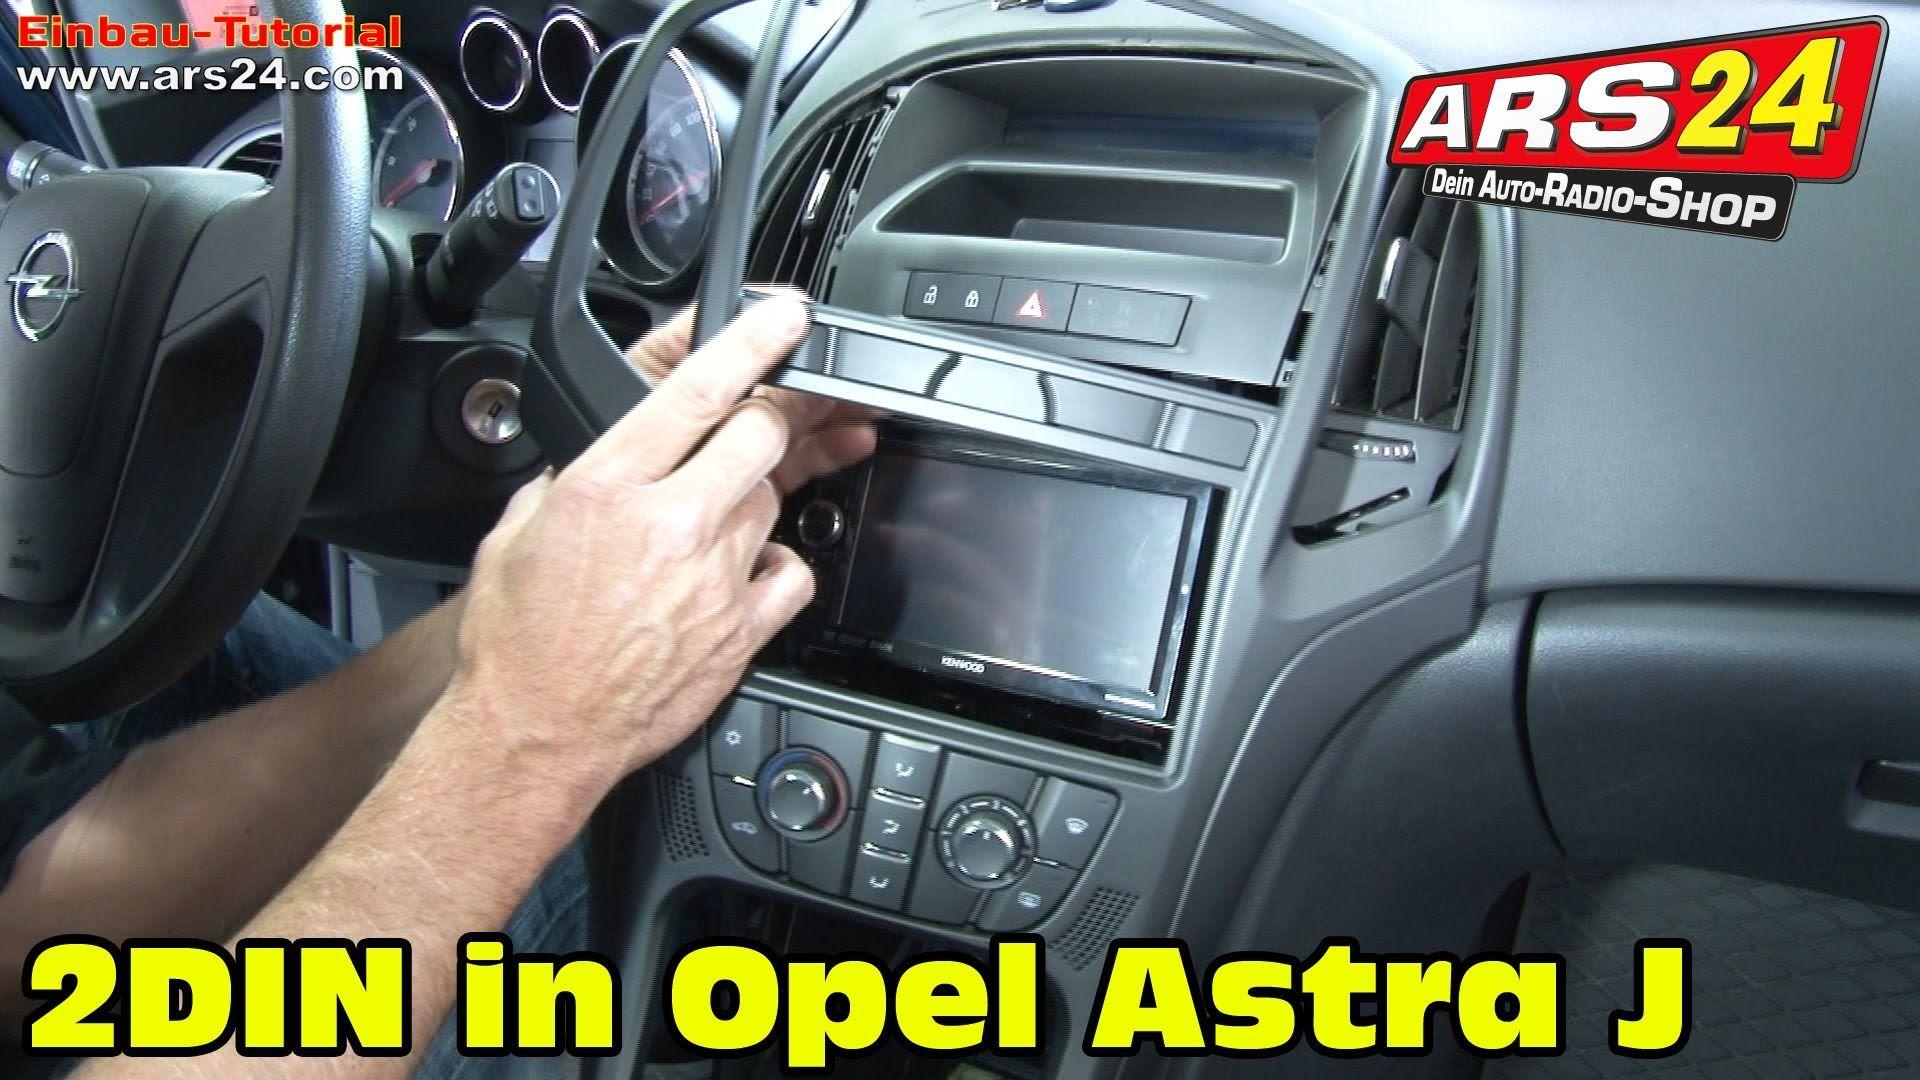 Autoradio einbauen im opel astra j tutorial welche adapter ebook free opel astra g manual fandeluxe Image collections